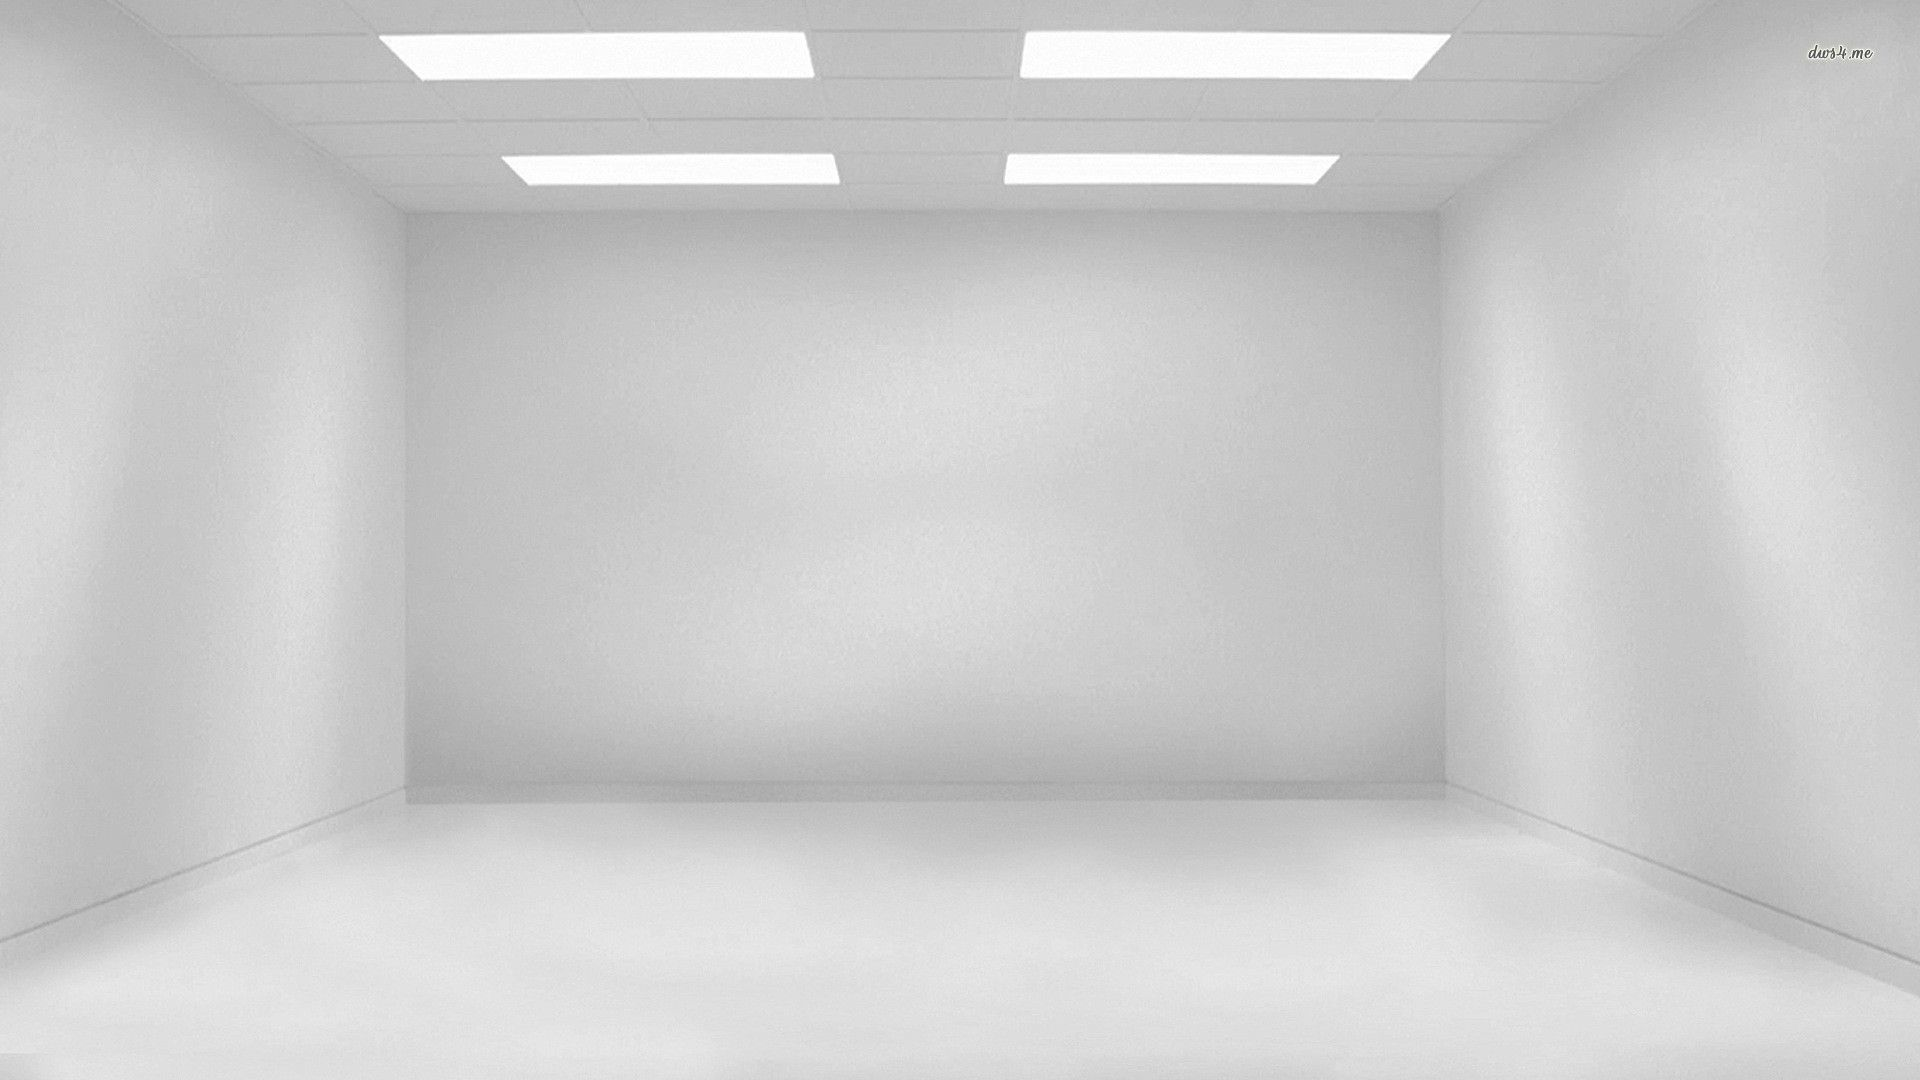 White room 005 black and white and grey pinterest for White wallpaper room